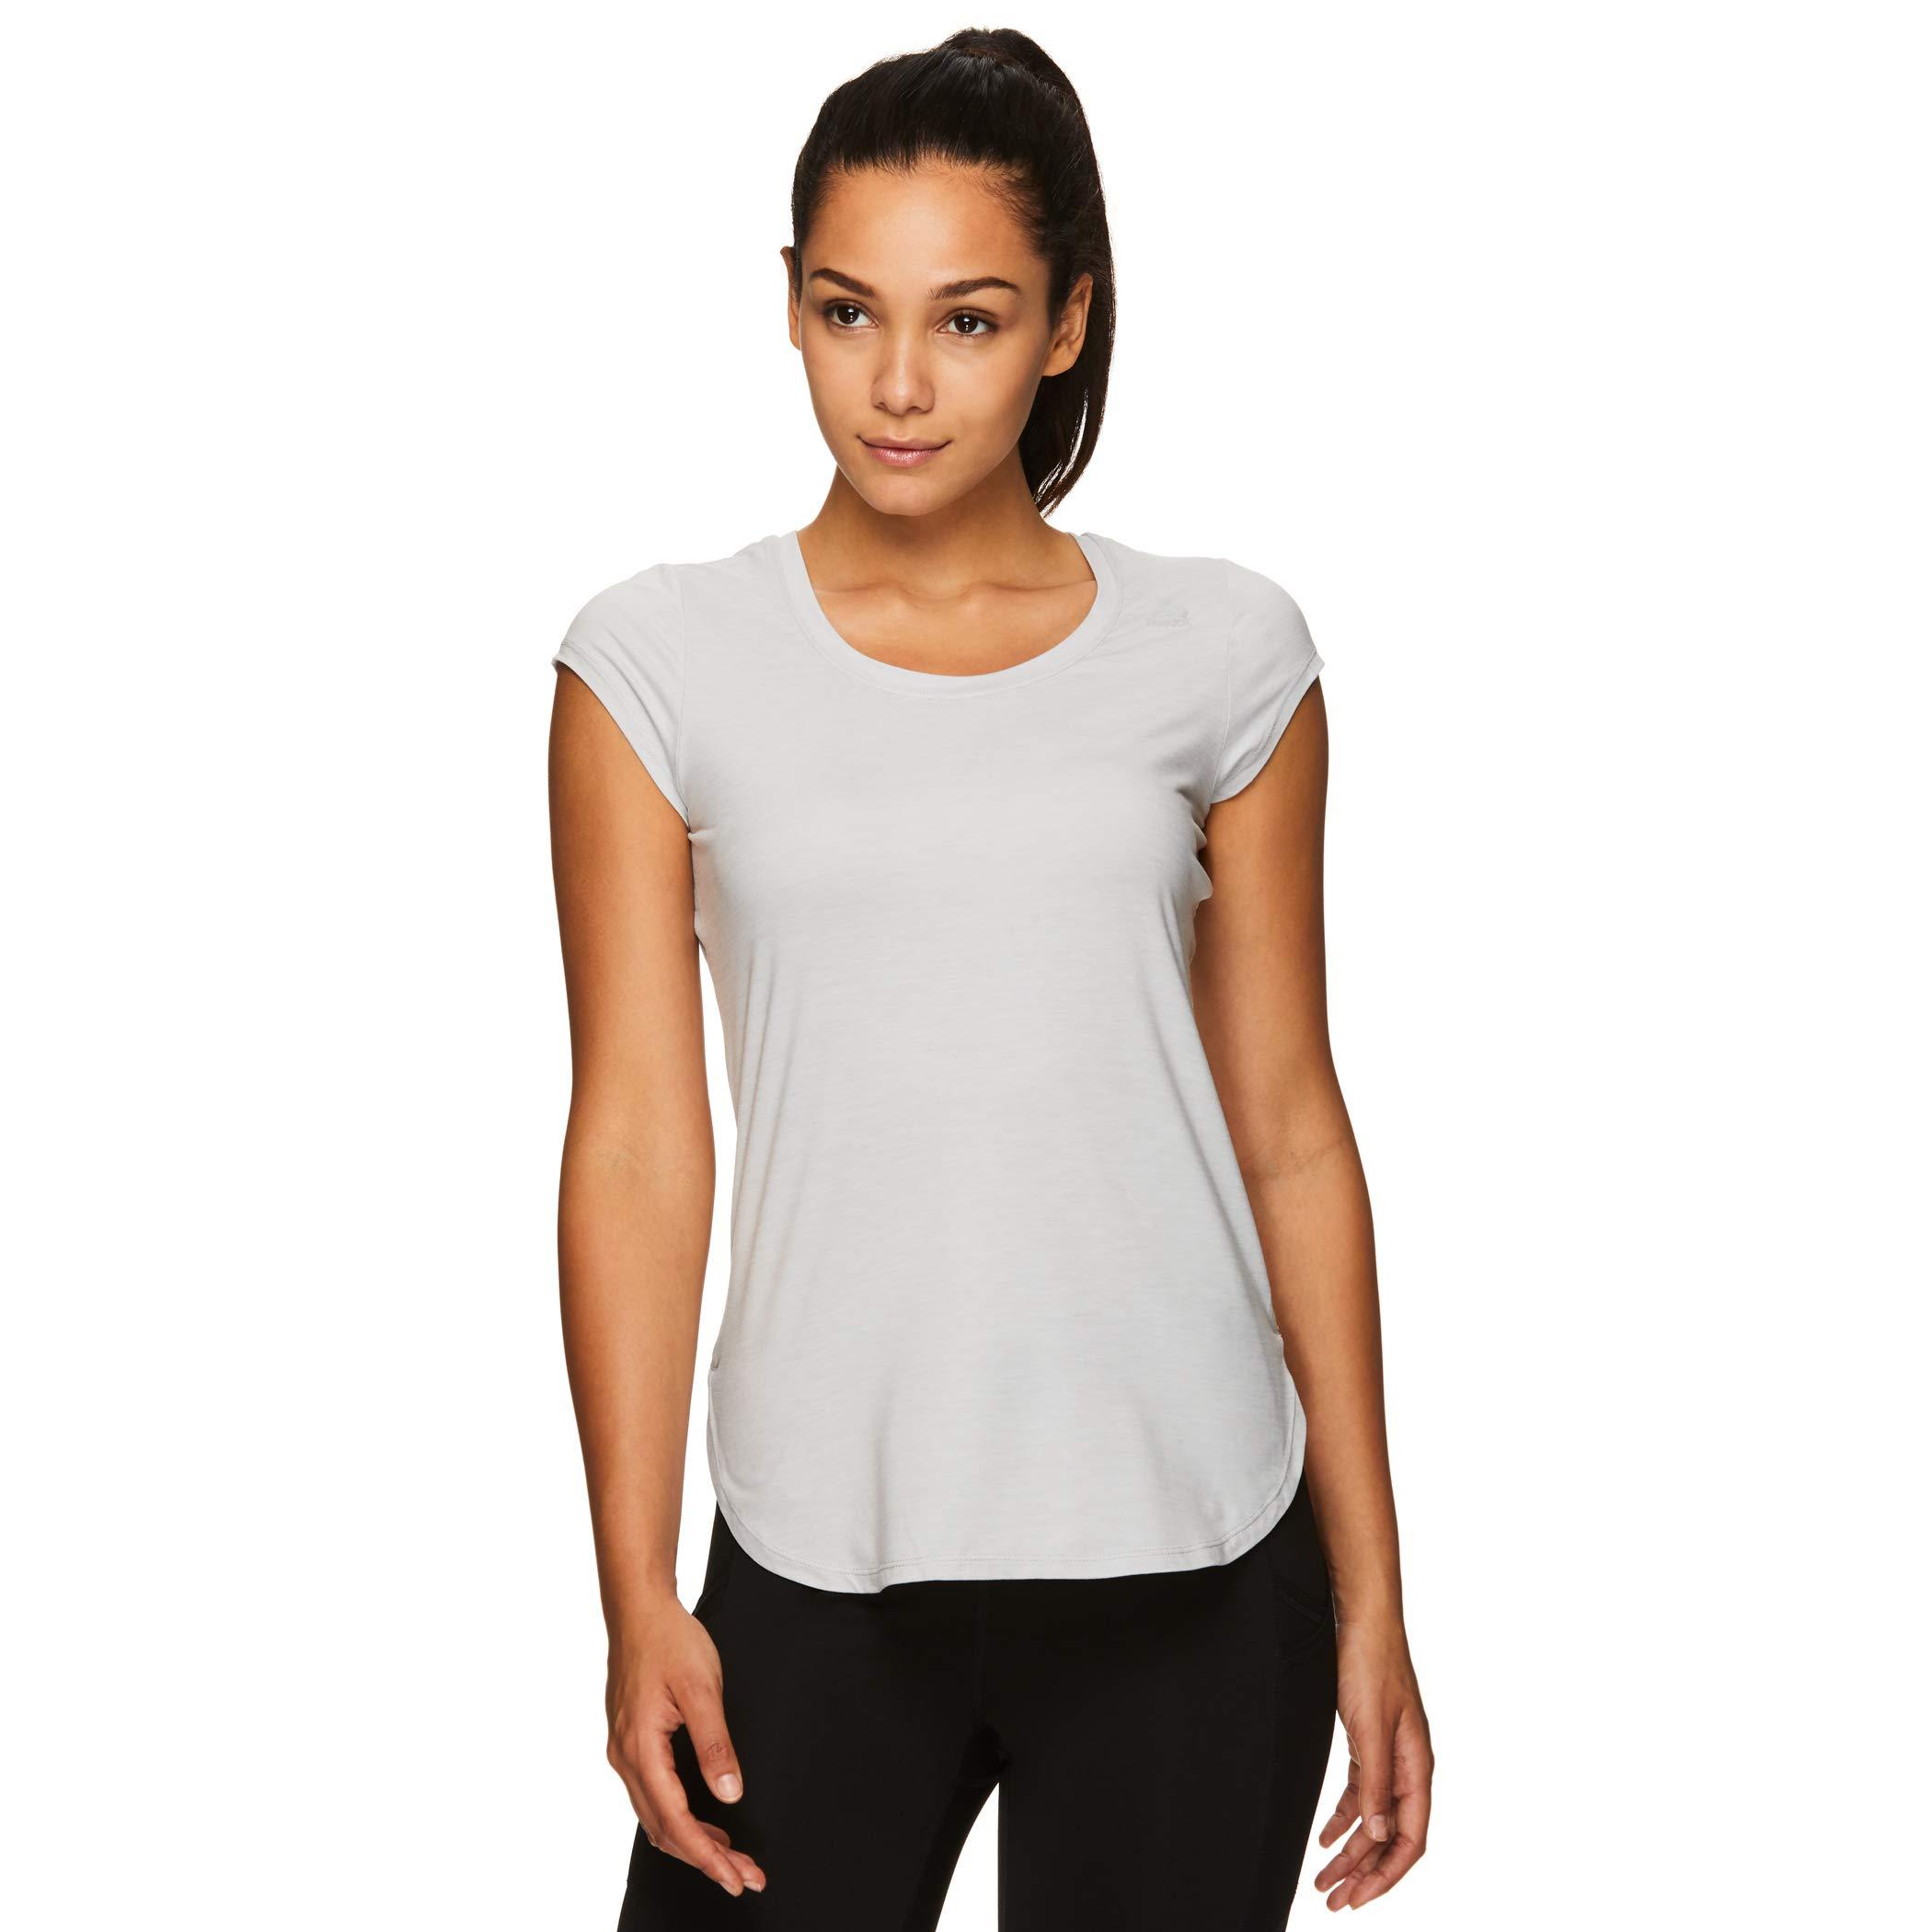 Reebok Women's Legend Performance Top Short Sleeve T-Shirt - Legends Grey Sky Heather, Small by Reebok